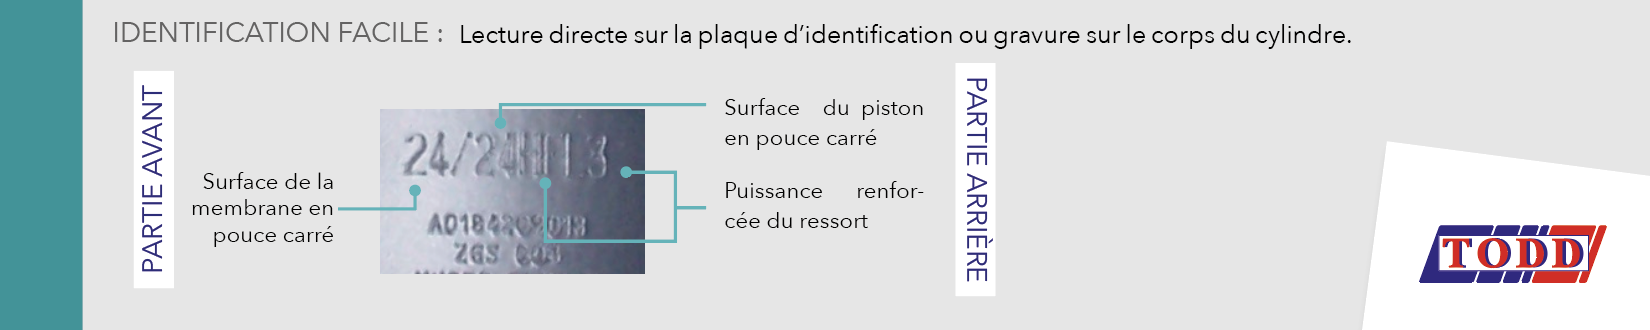 Image identification